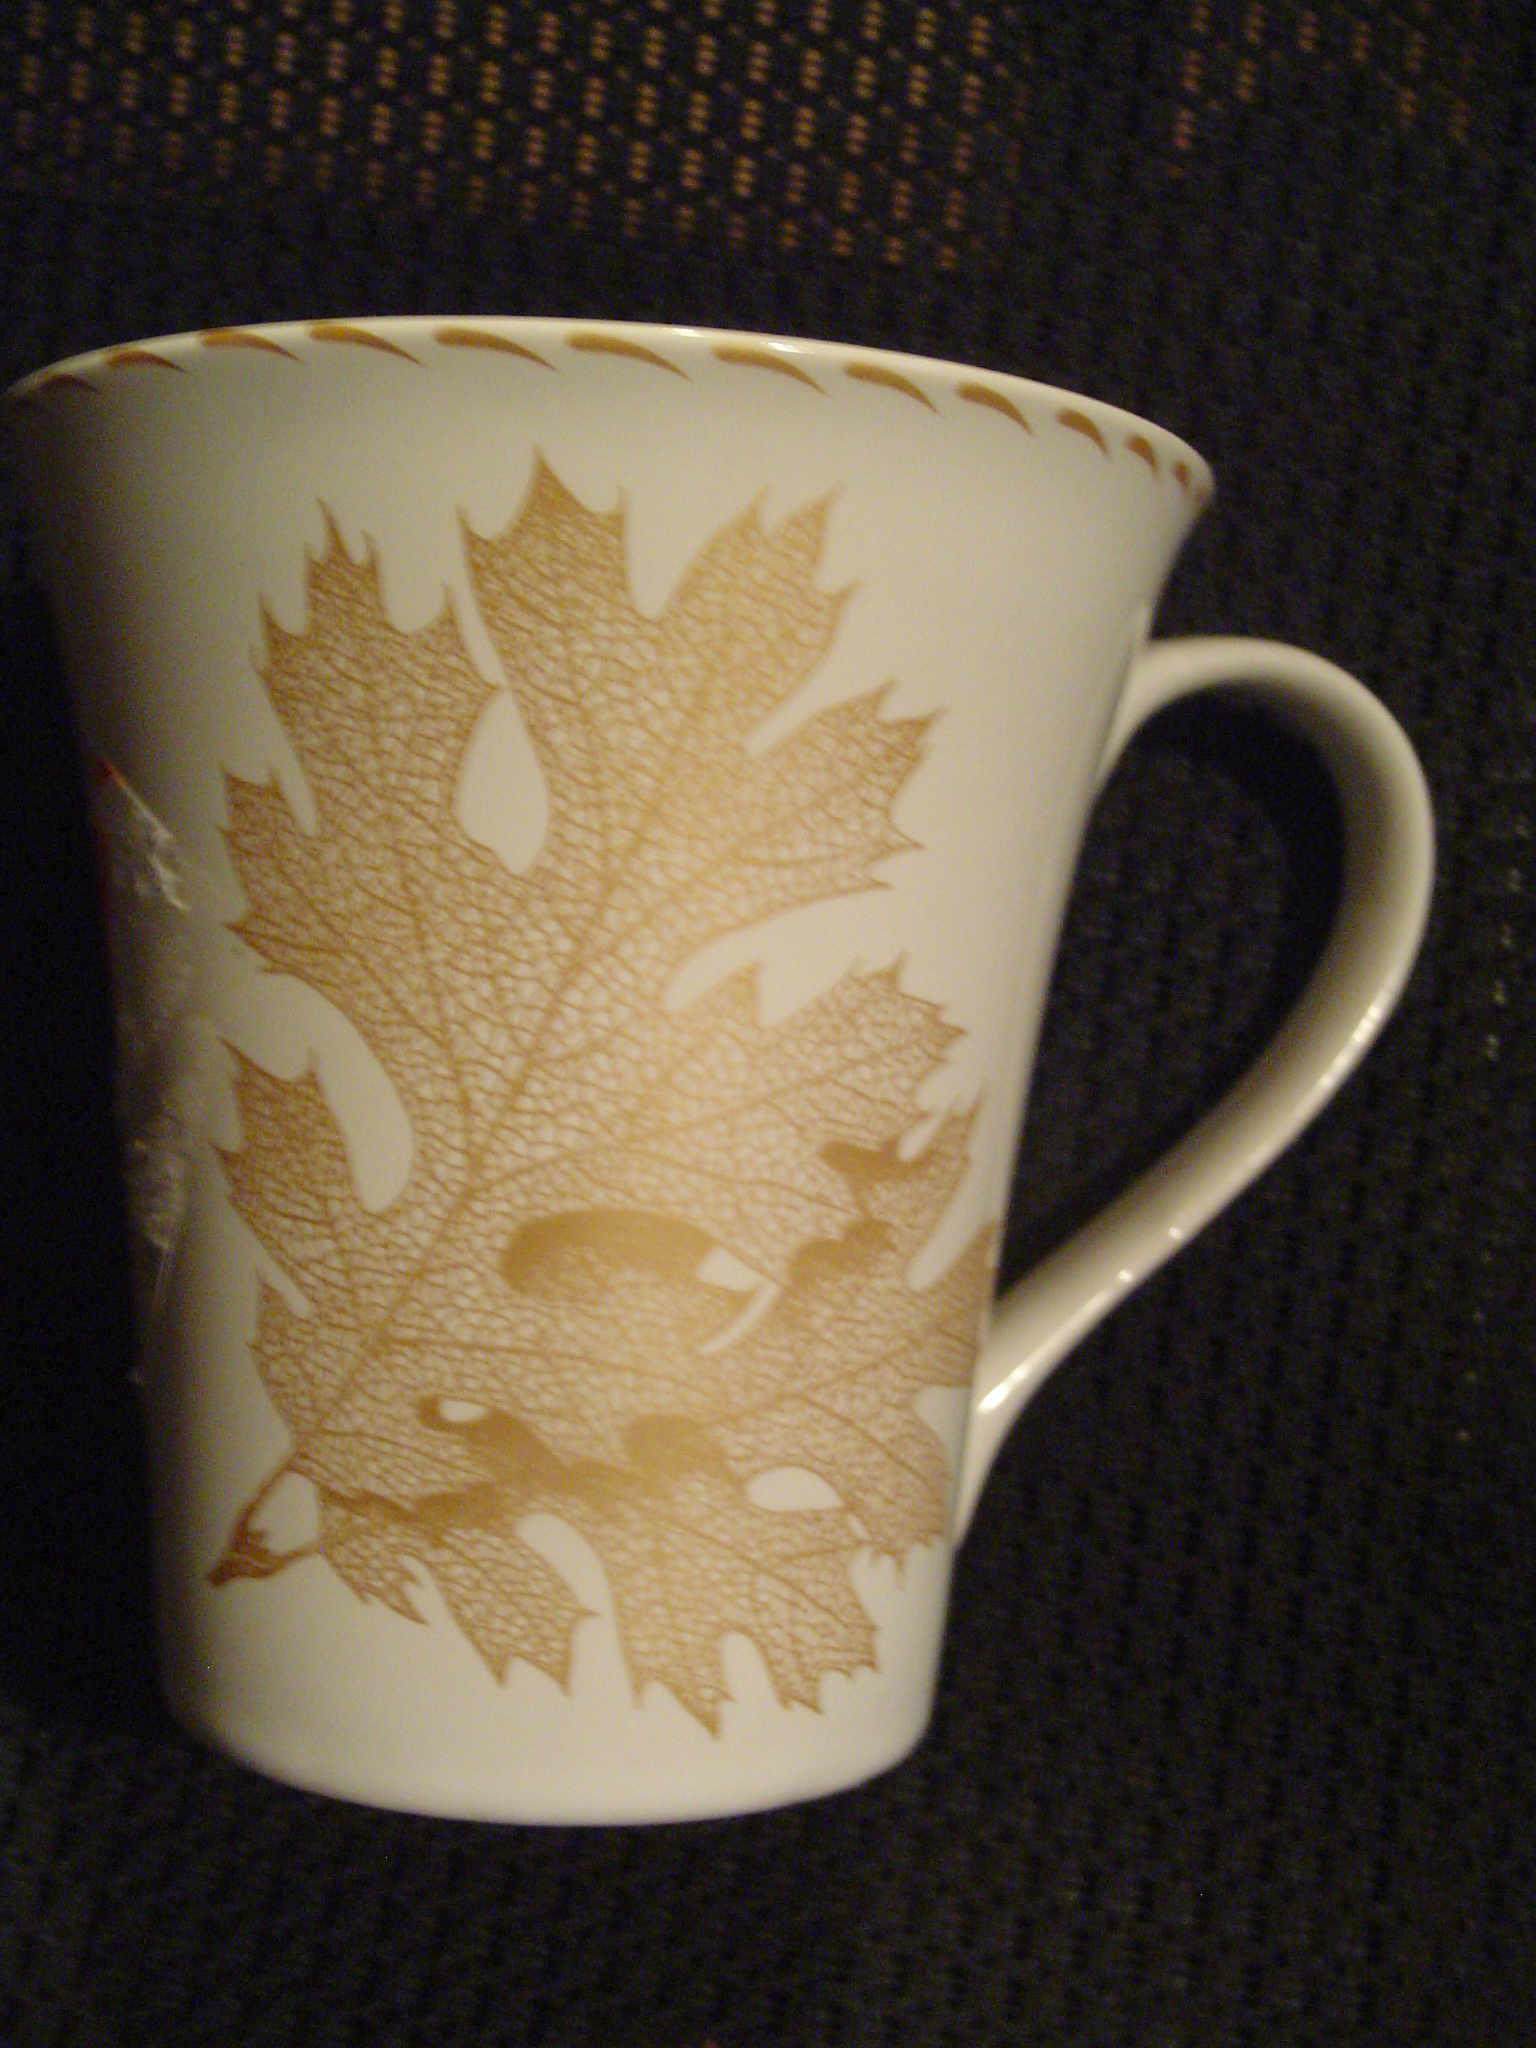 222 Fifth Avenue Gold Leaf Tall Mugs Reduced 40%